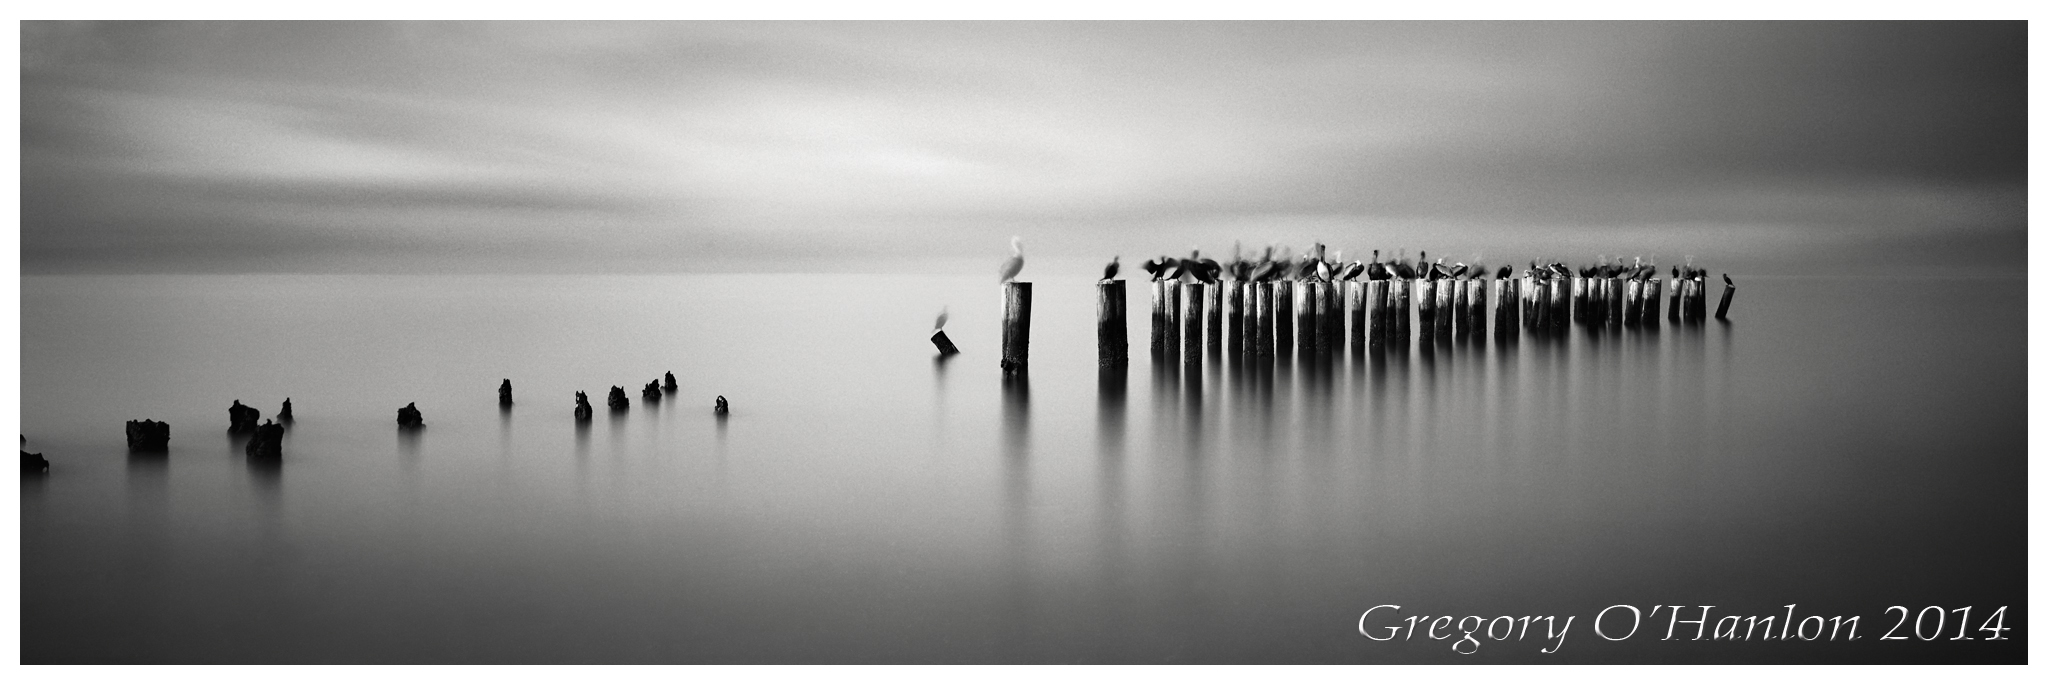 Jetty - Pelicans